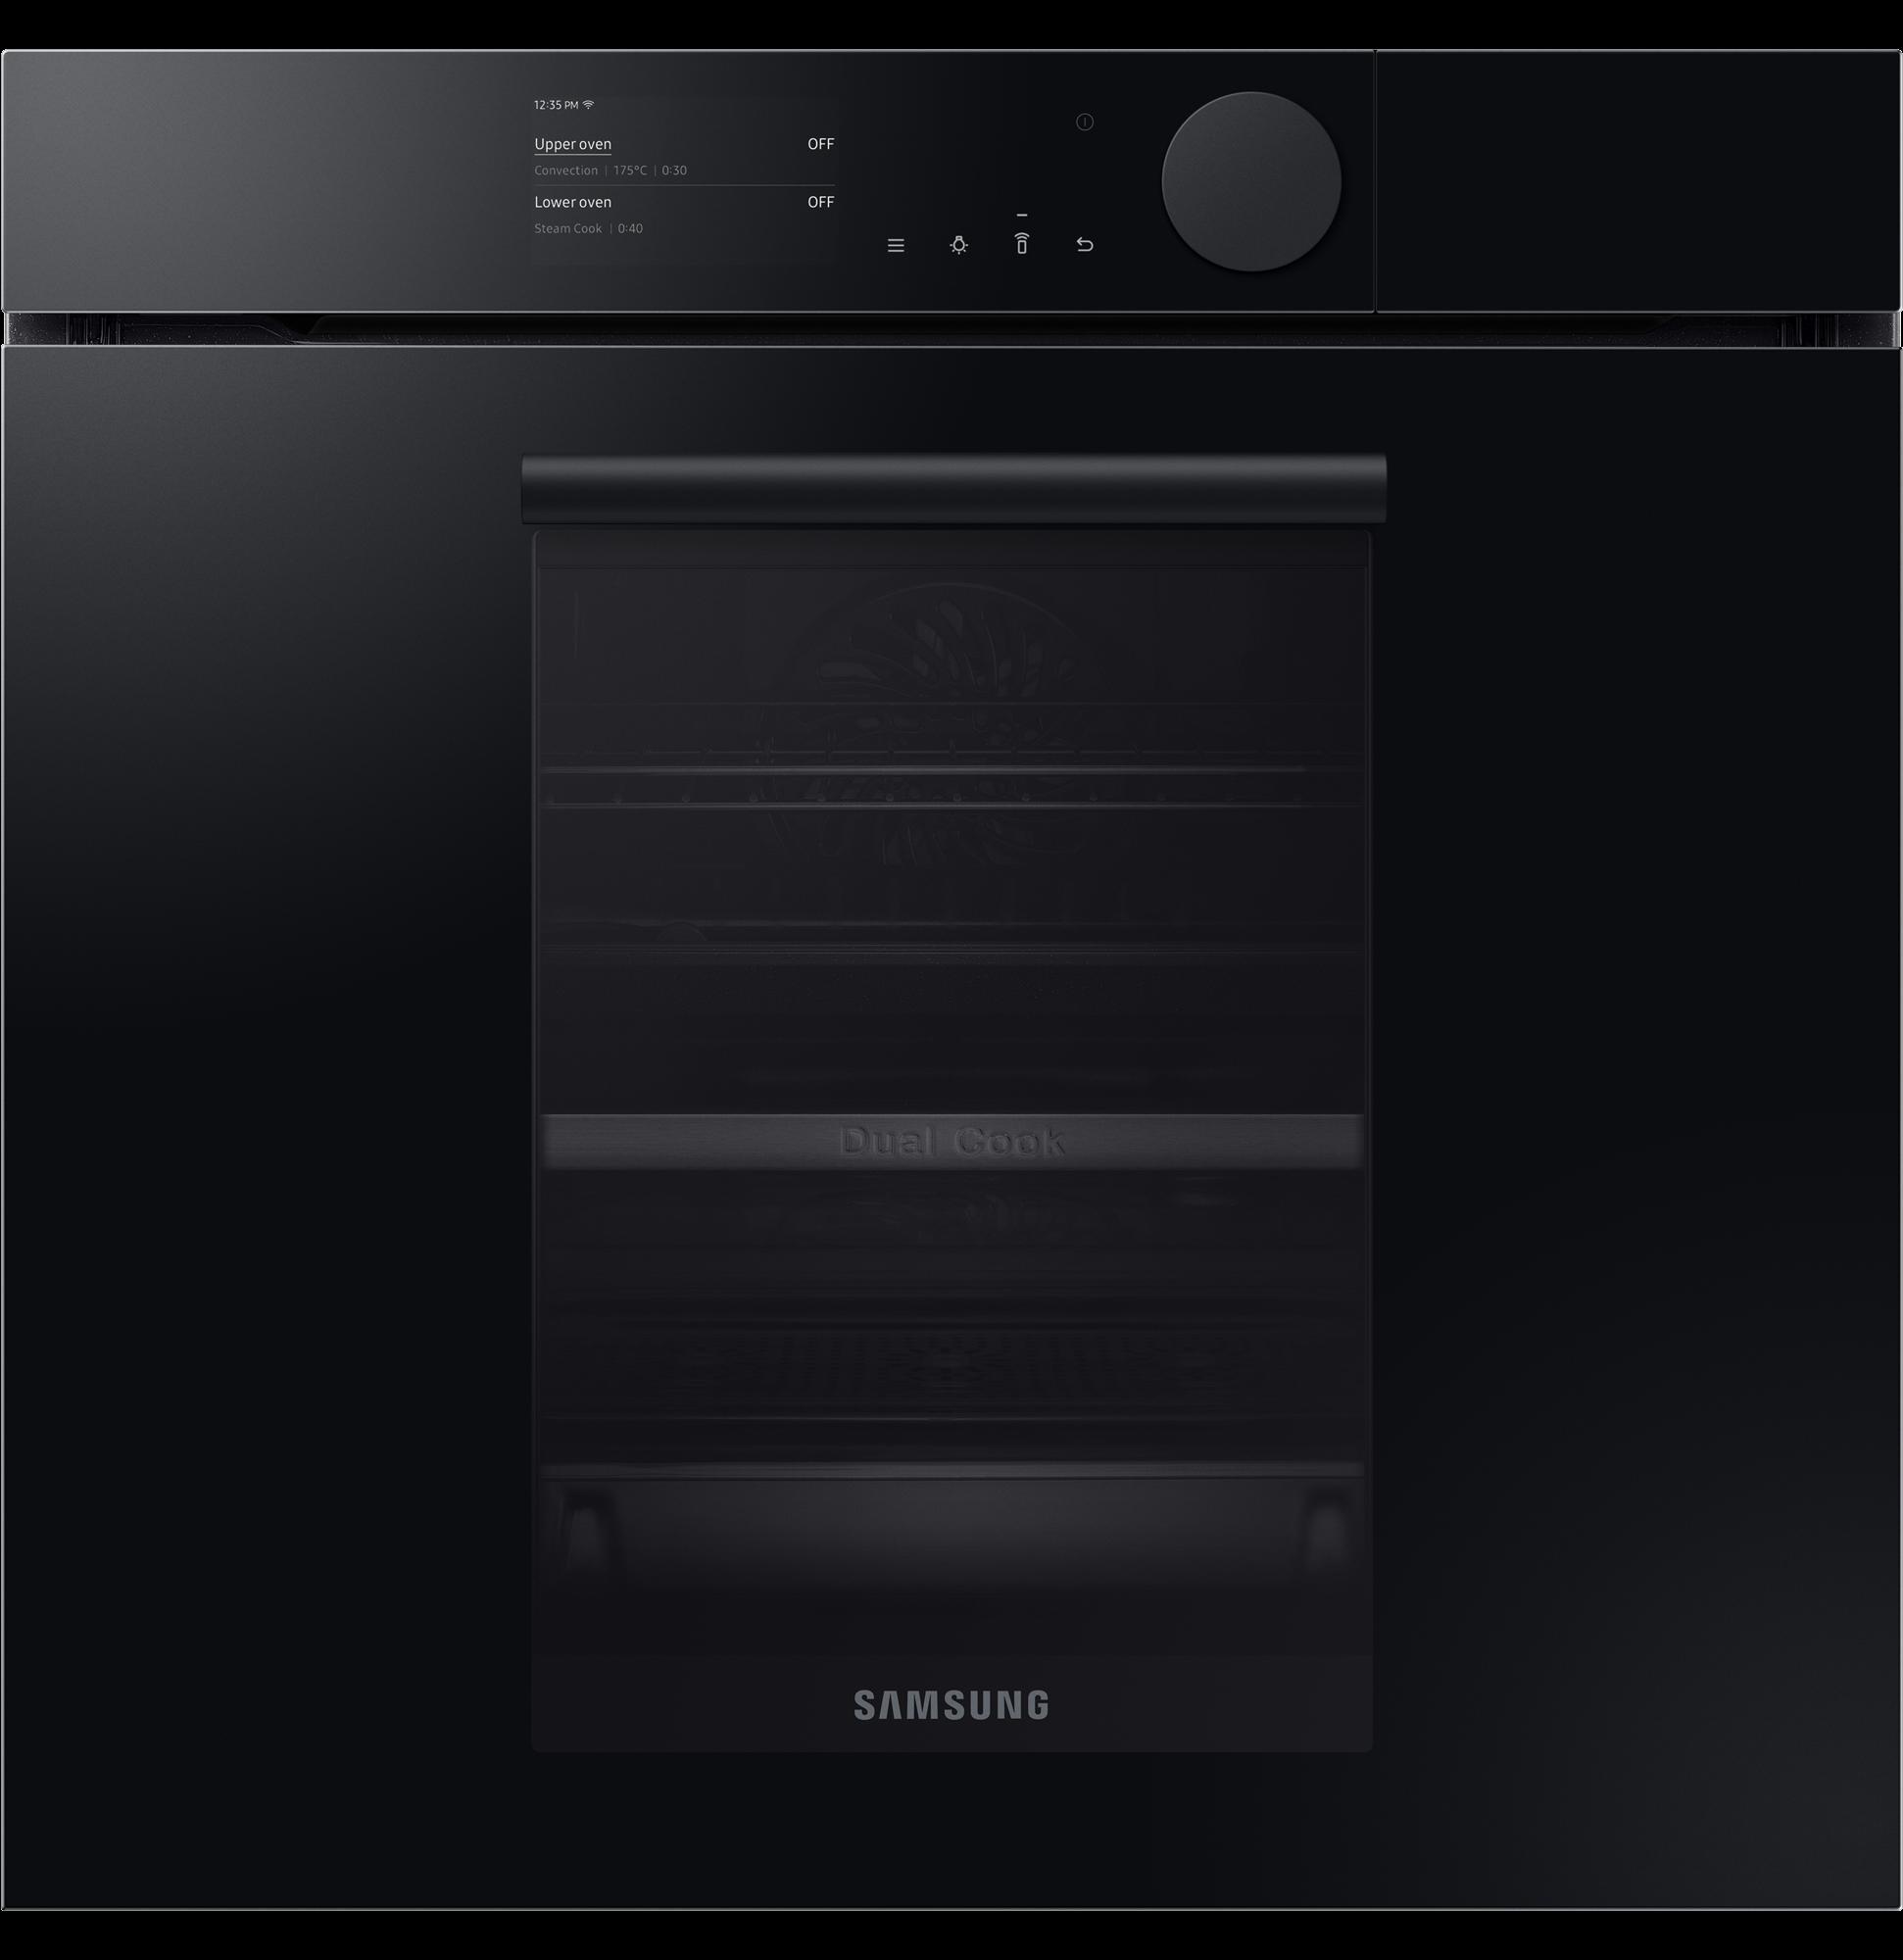 Samsung Infinite Range – Dual Cook Steam Nv75T8979Rk/Eu Black